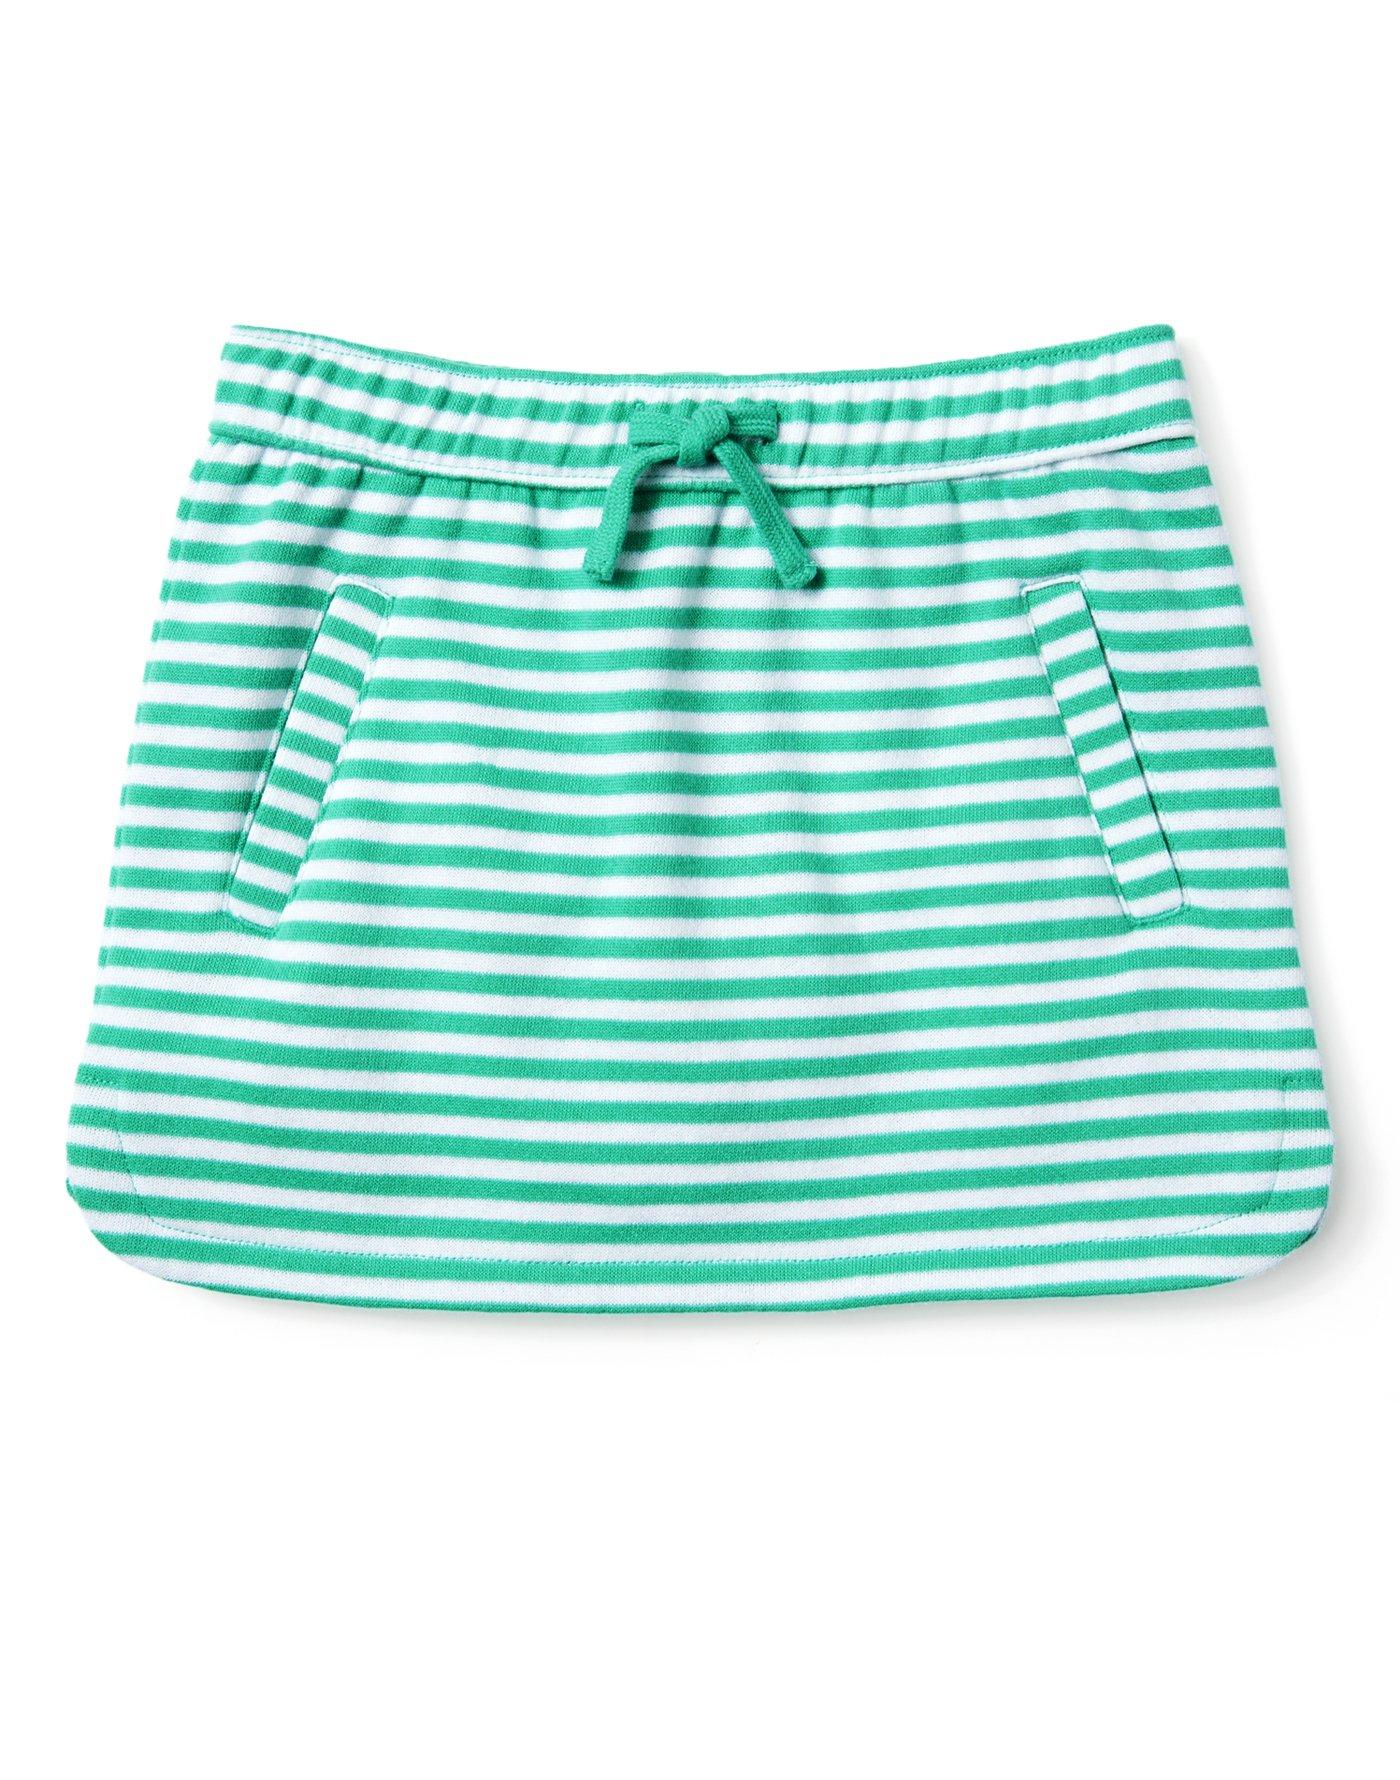 Gymboree Little Girls' Dolphin Skirt, Bright Teal Stripe, S